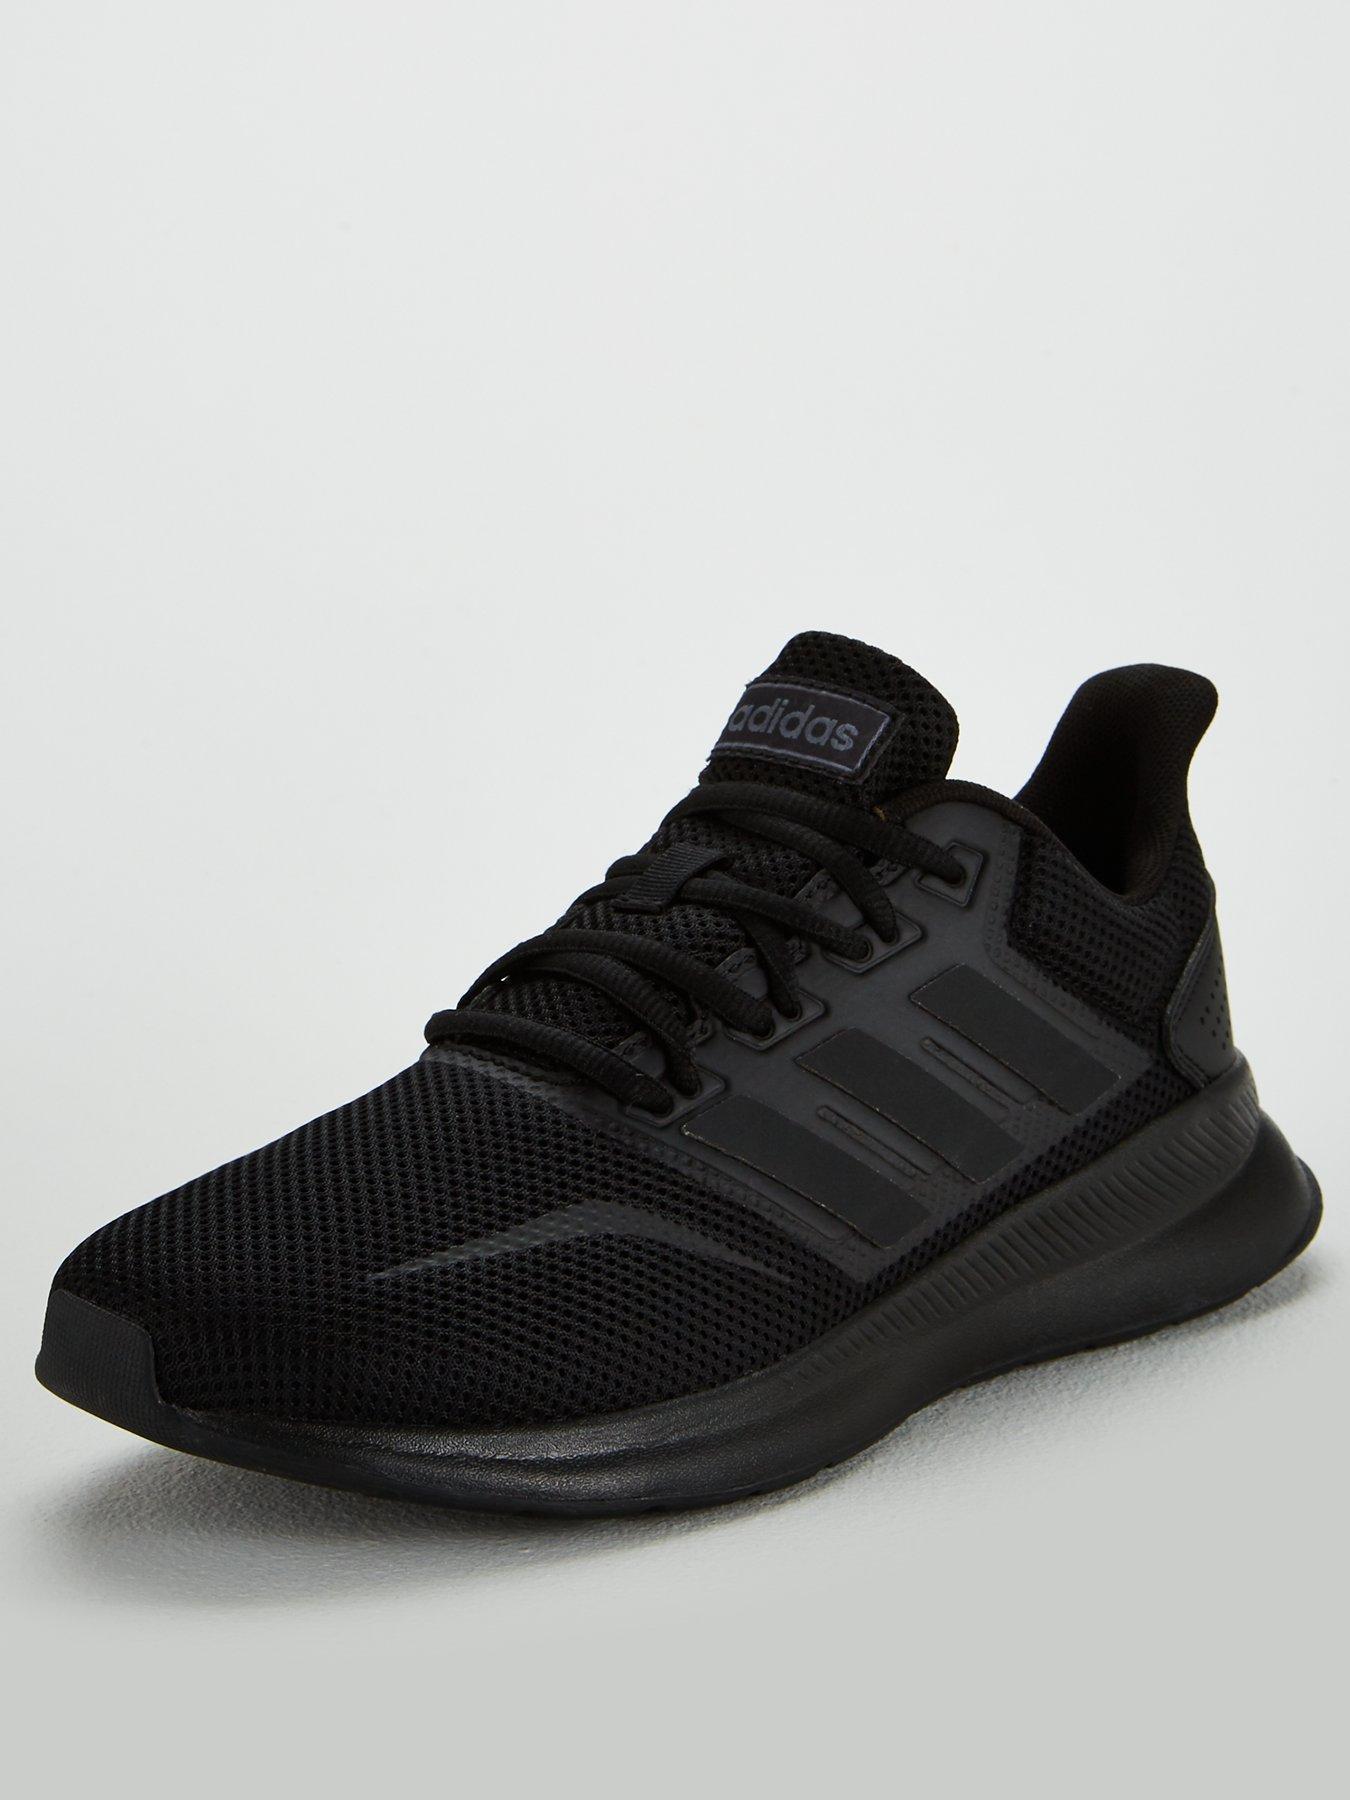 Adidas Originals Gazelle Black Leather (Women's) NWT